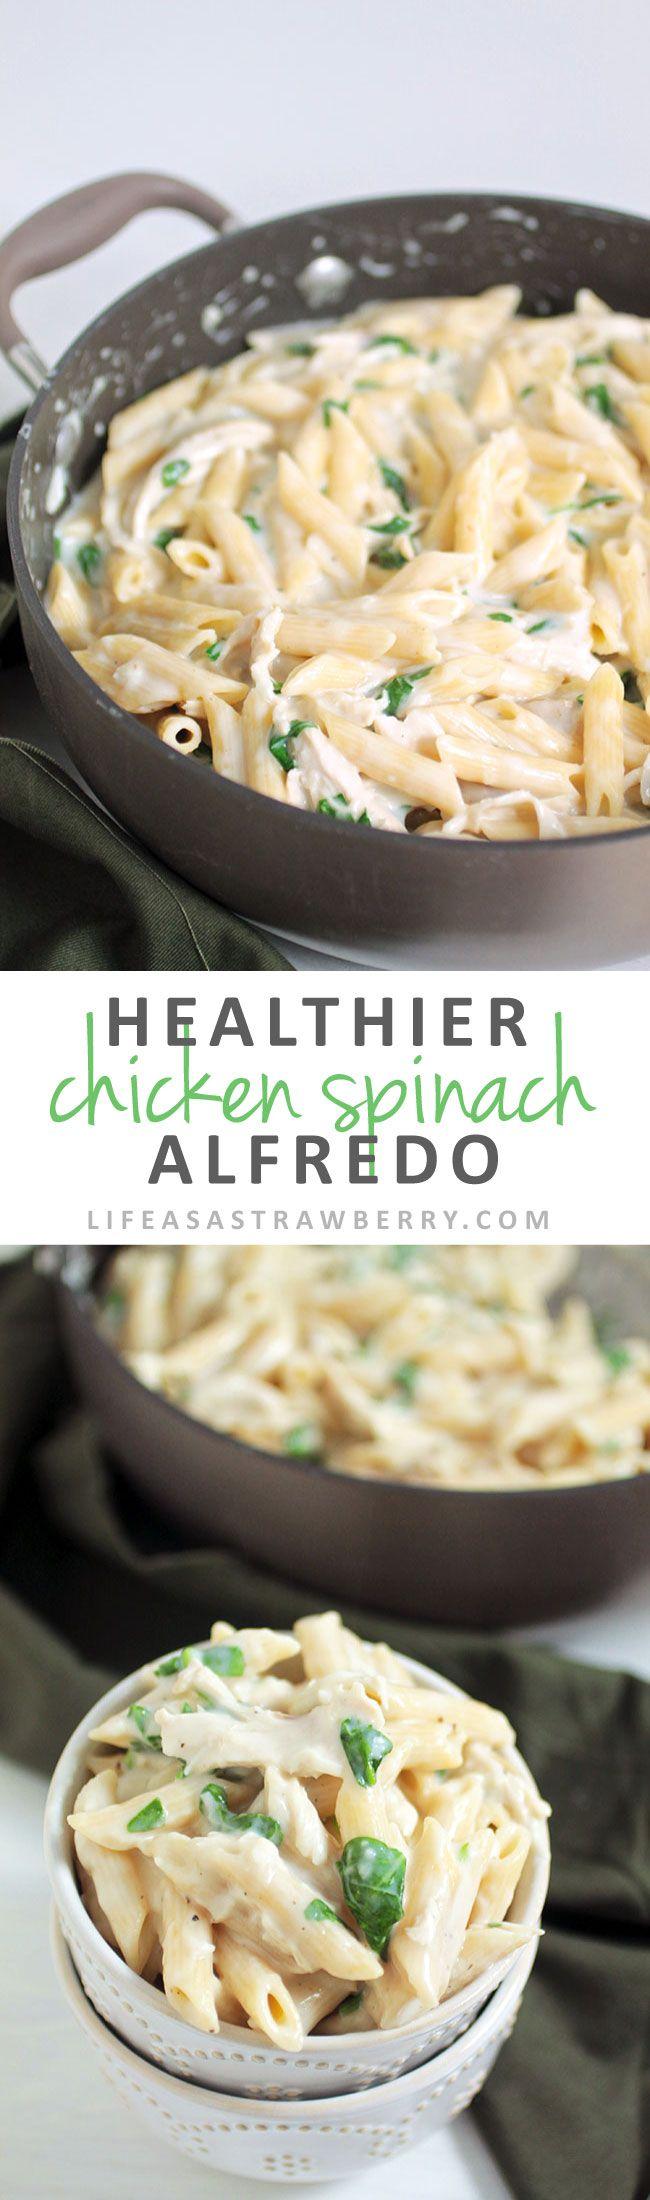 Healthier Chicken Spinach Alfredo | Lighten up a classic Fettuccine Alfredo recipe with this easy pasta recipe! Ready in 30